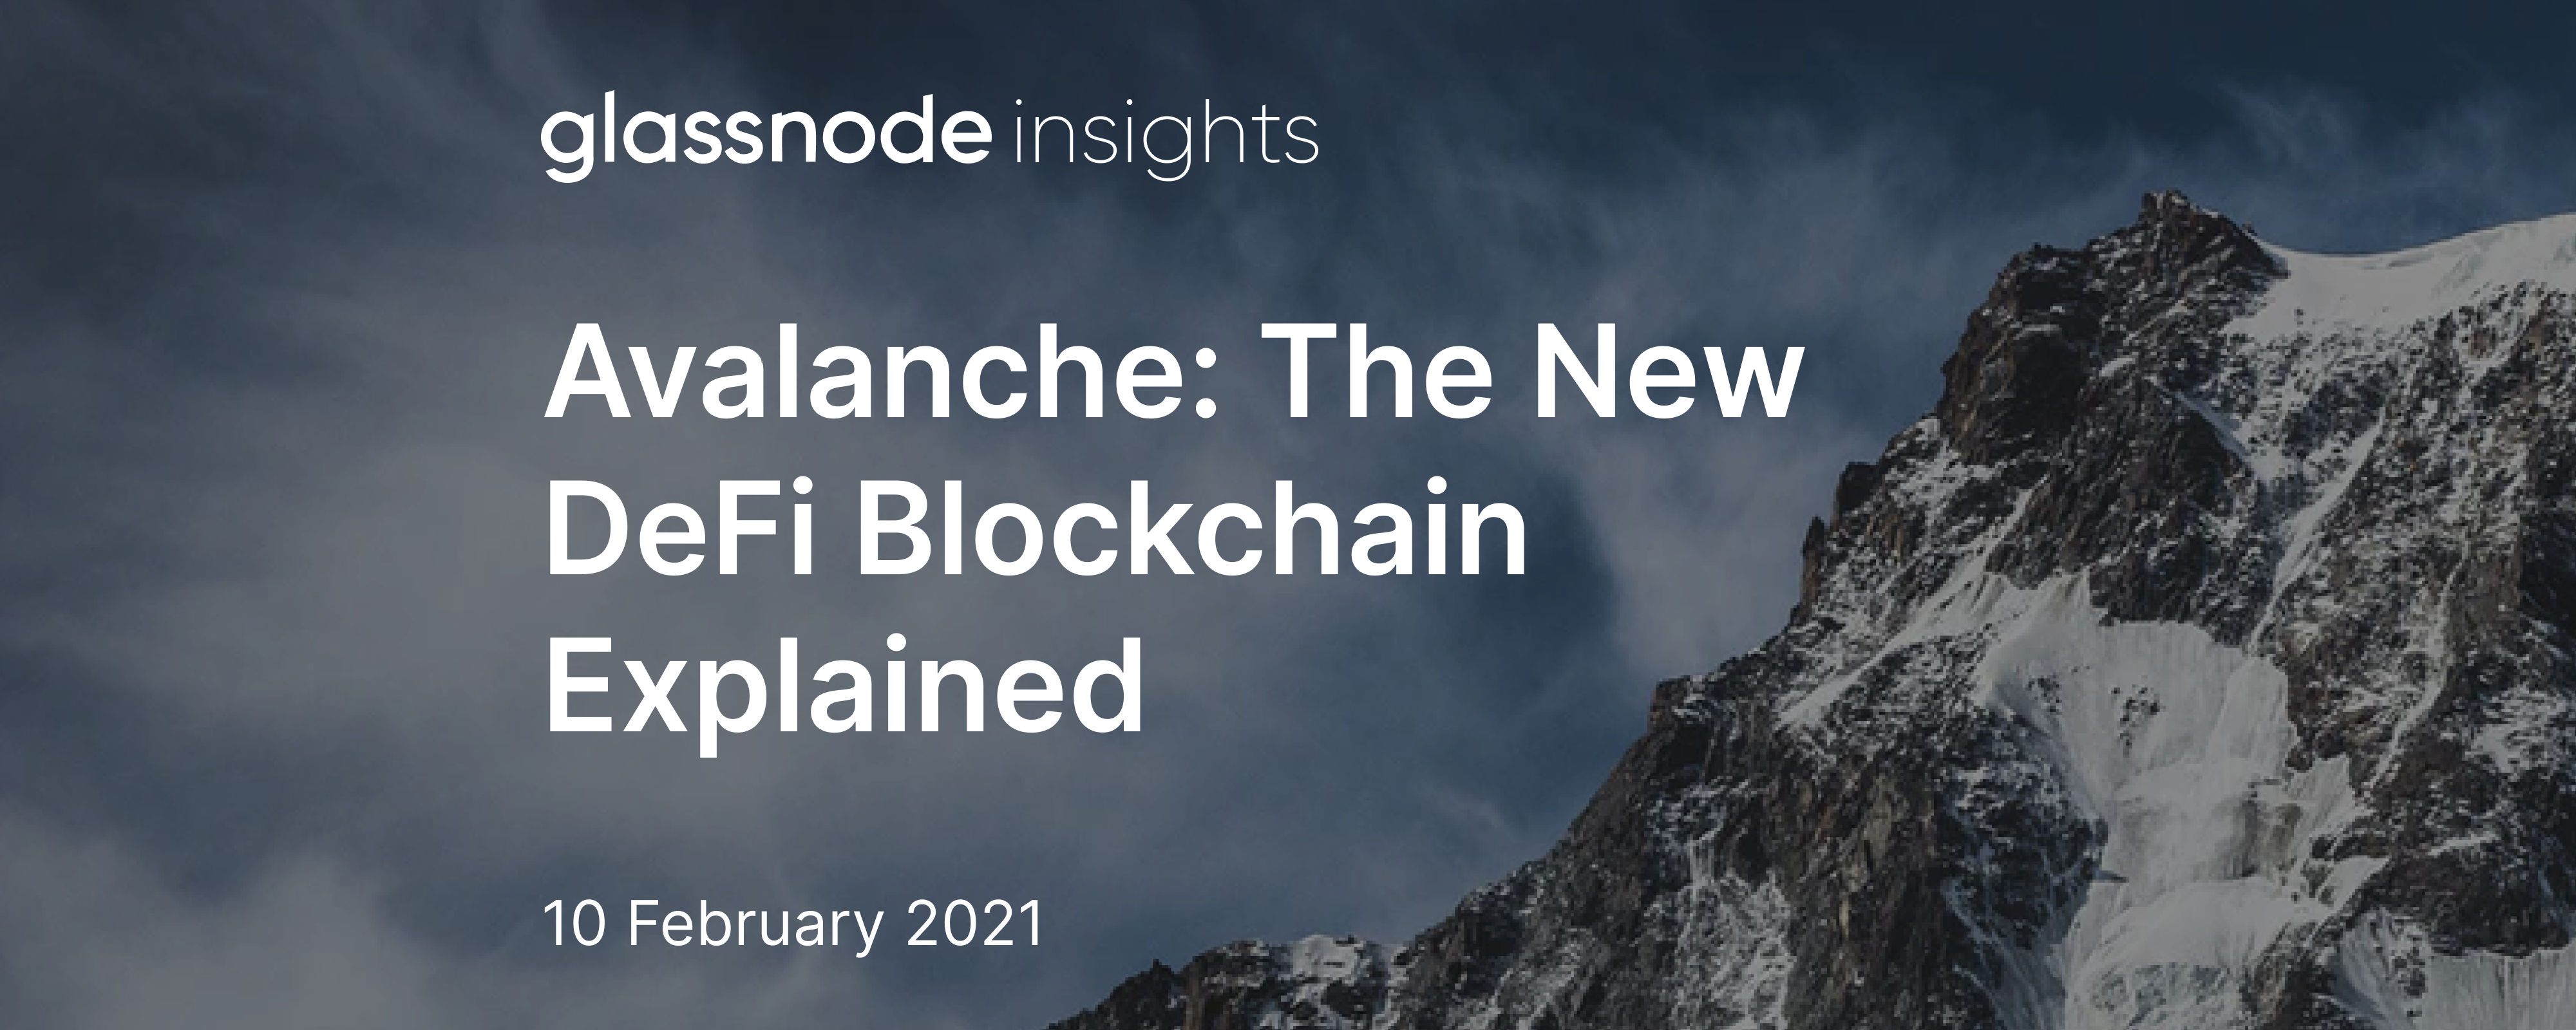 Avalanche: The New DeFi Blockchain Explained